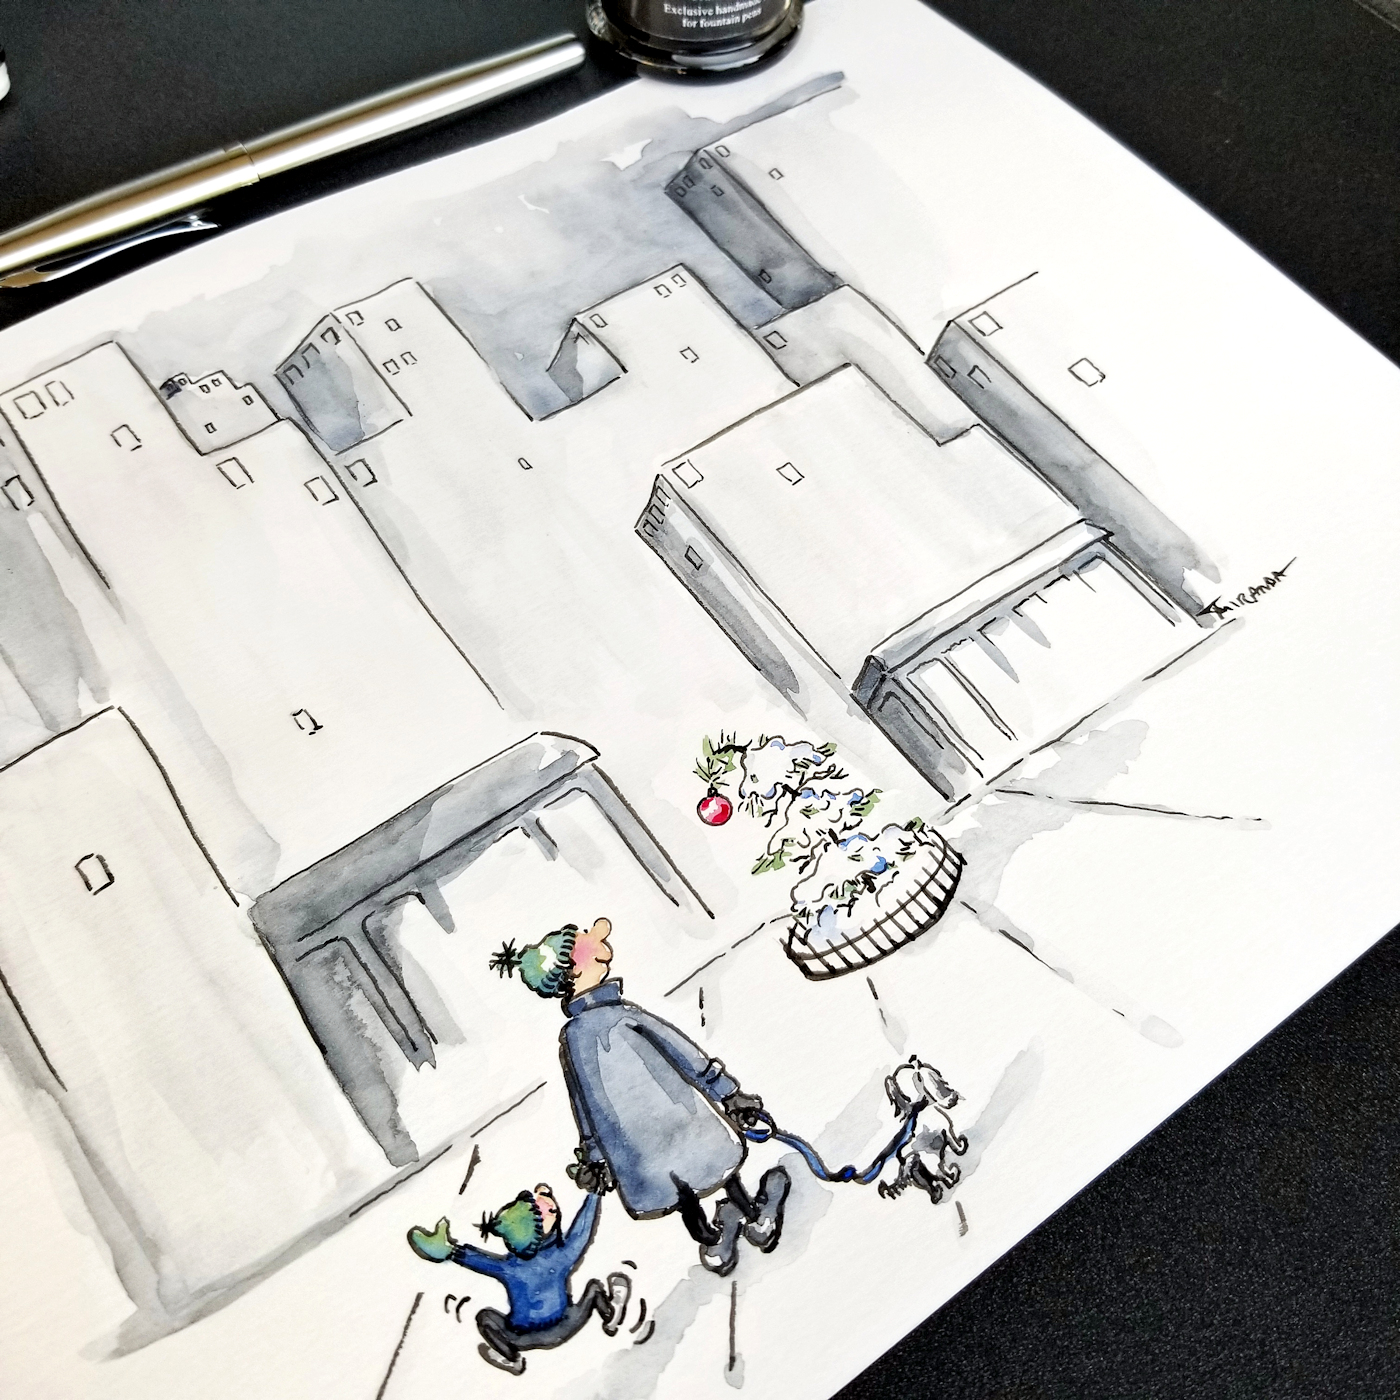 JMSC-182 Merry and Bright photo of original illustration by Joana Miranda - Detail2